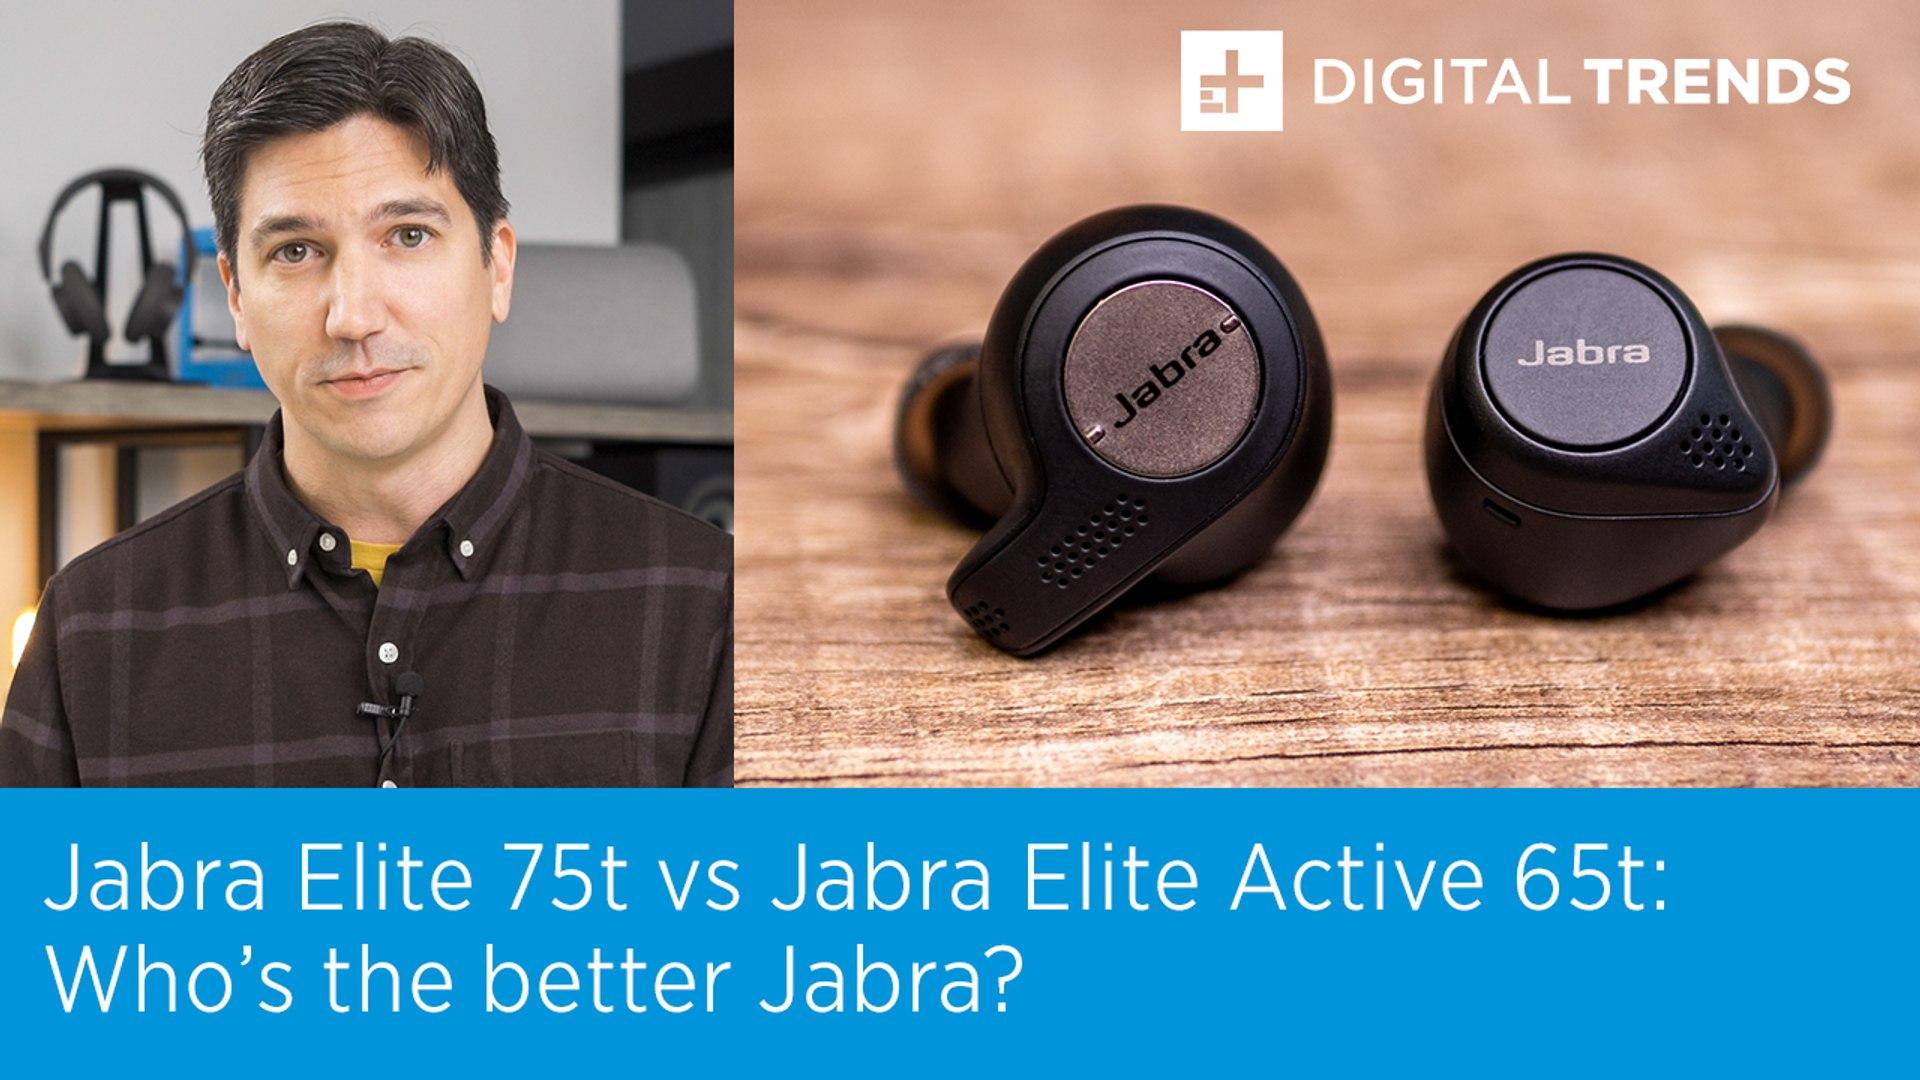 Jabra Elite 75t Vs Jabra Elite Active 65t Who Is The Better Jabra Video Dailymotion